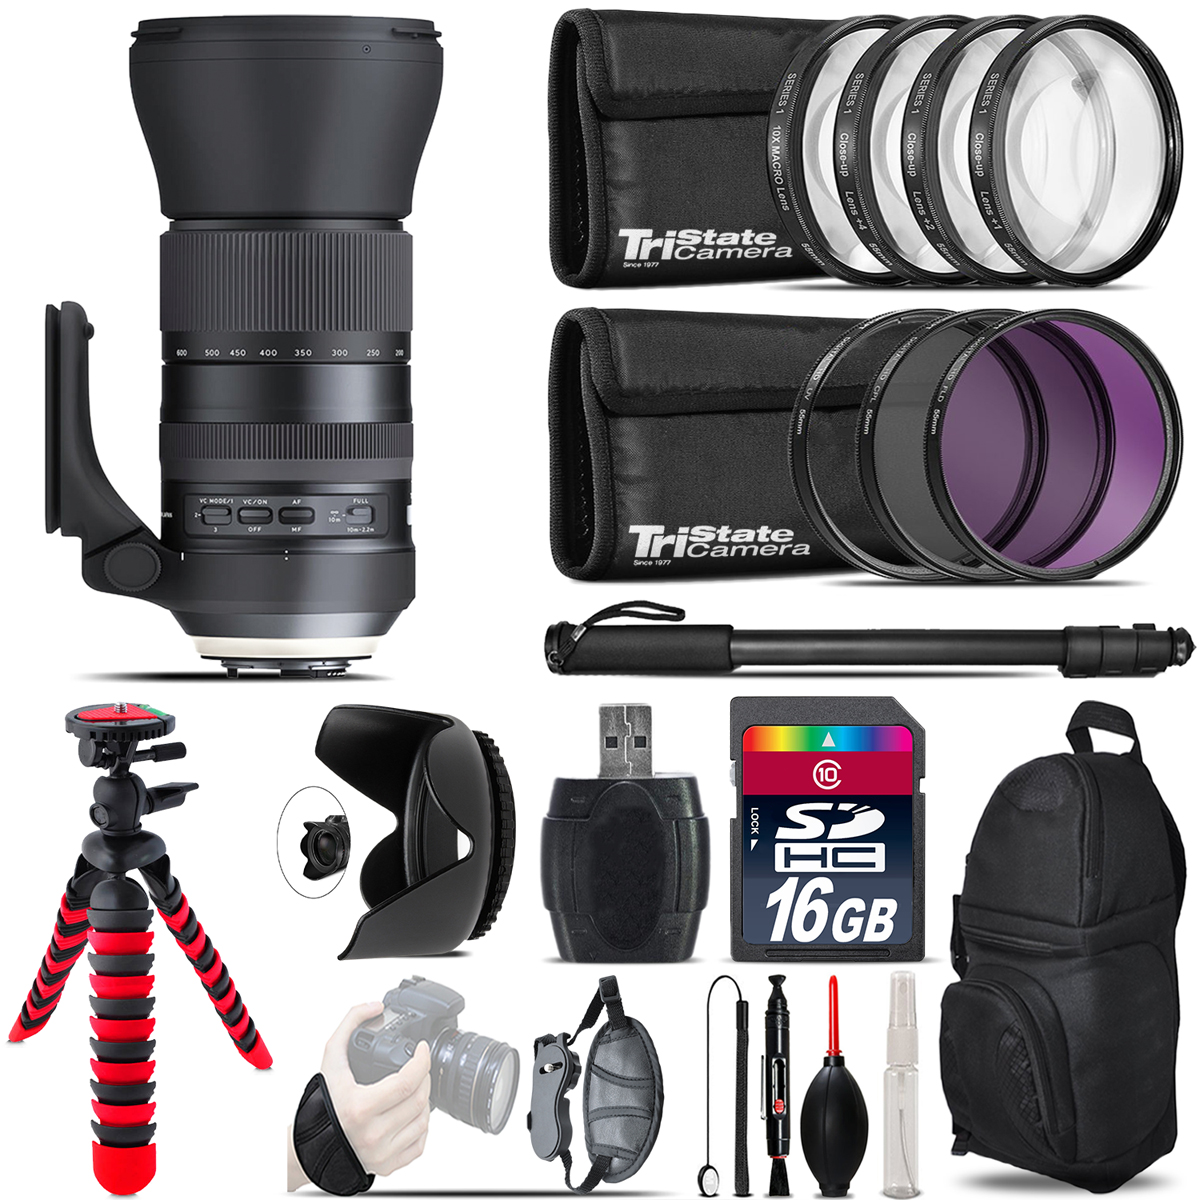 Tamron 150-600mm G2 for Nikon + Macro Filter Kit & More - 16GB Accessory Kit *FREE SHIPPING*